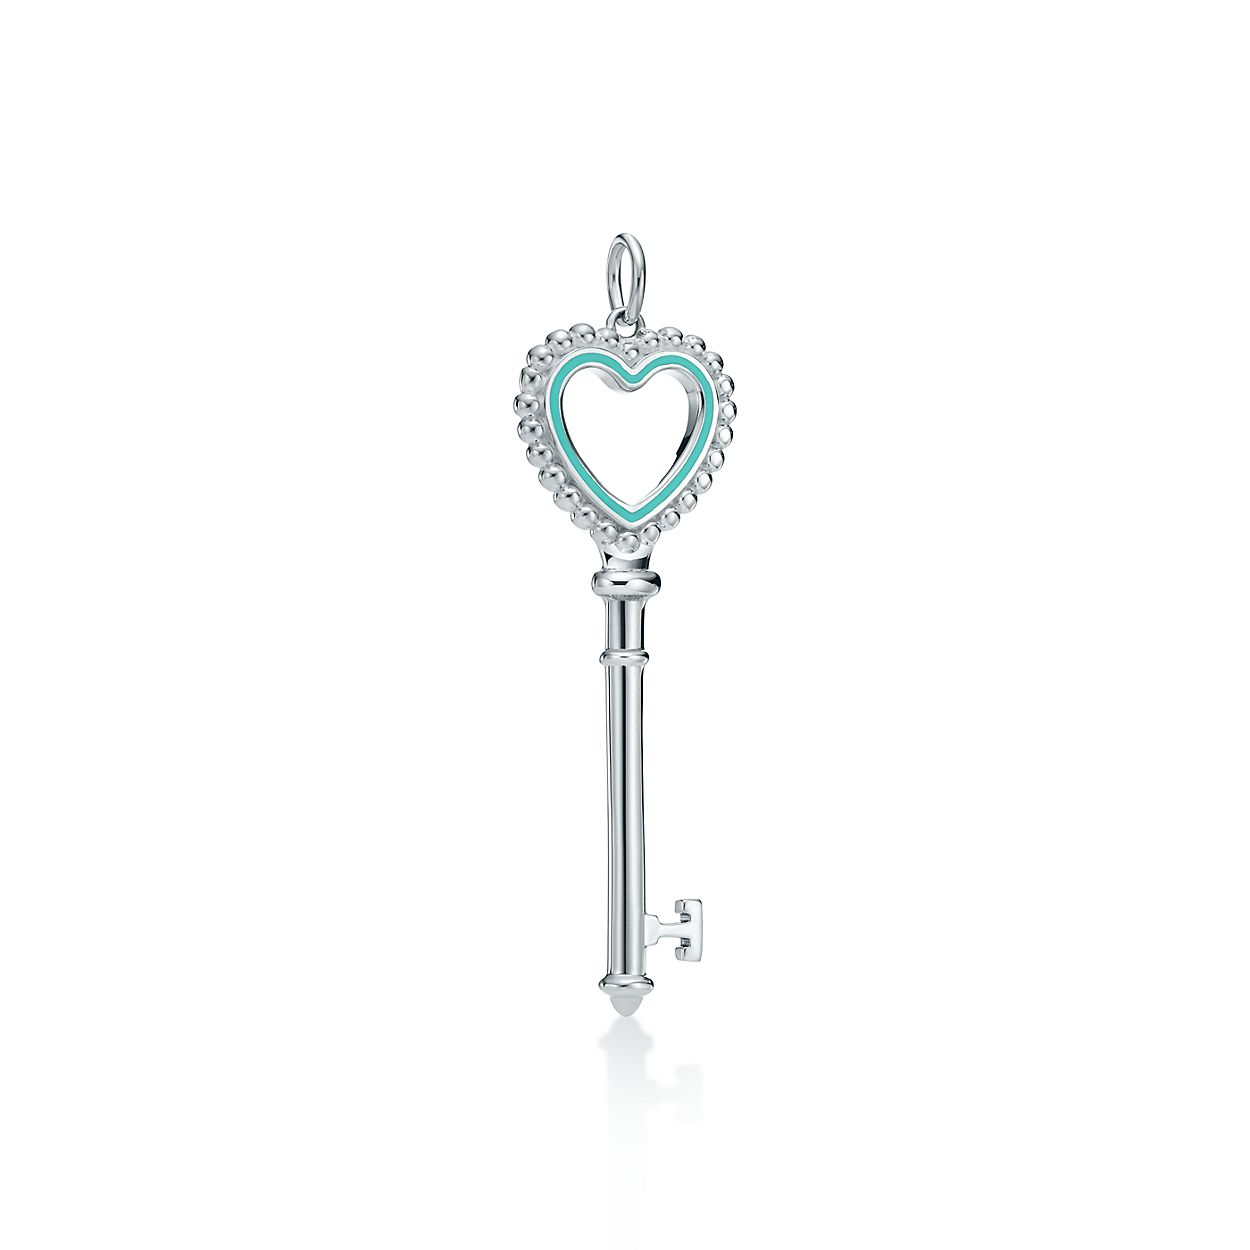 Tiffany Keys beaded heart key pendant in sterling silver with enamel finish Tiffany & Co. 2FdHbO